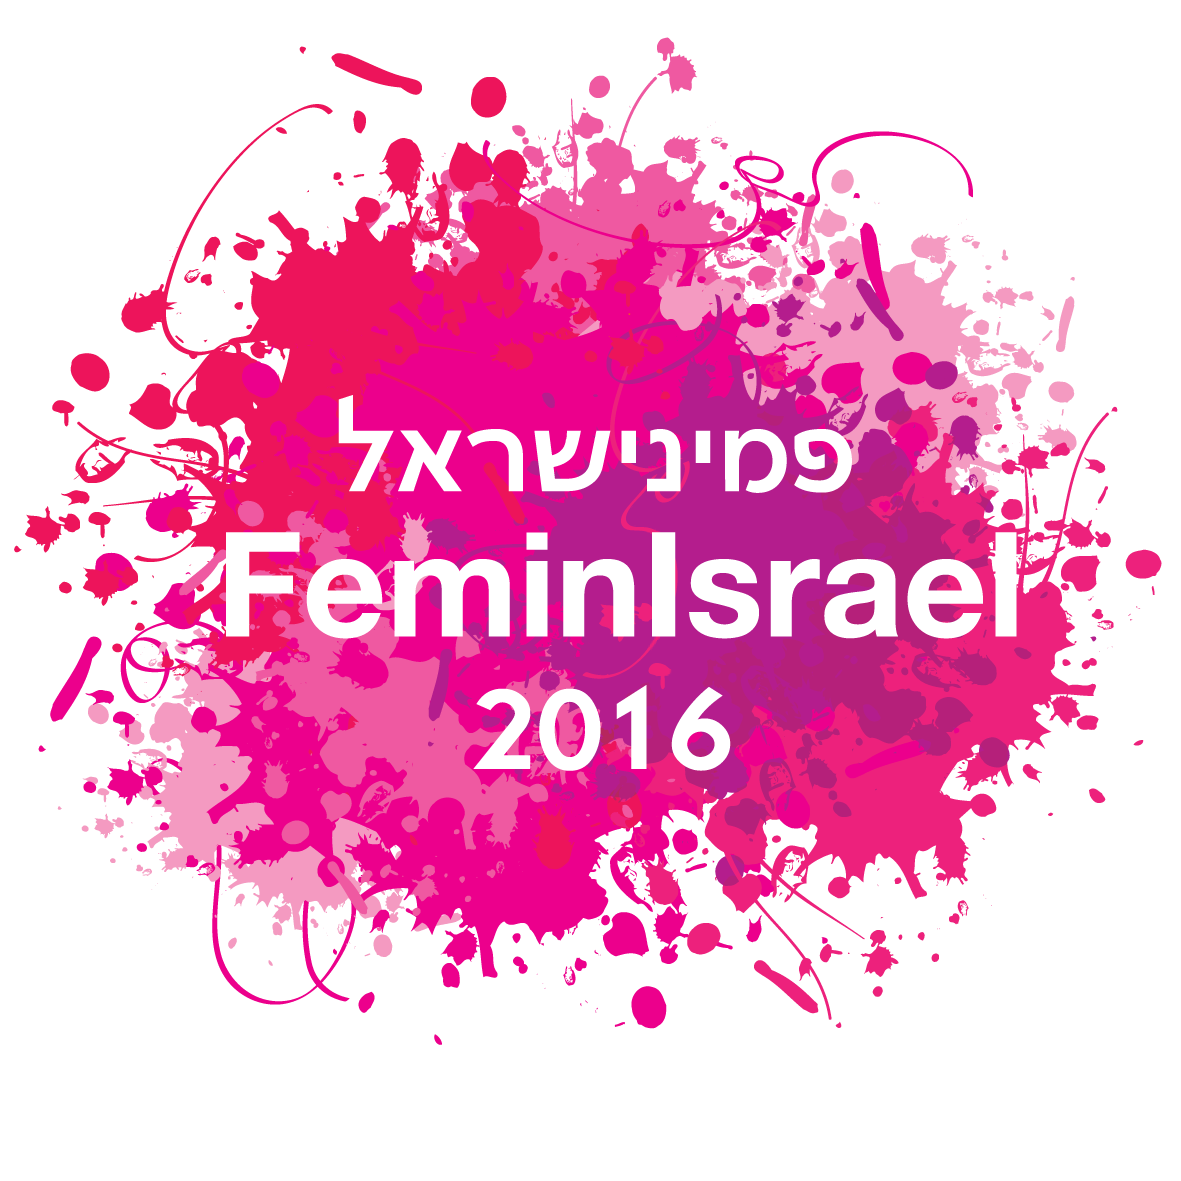 7276322_feminisraellogo